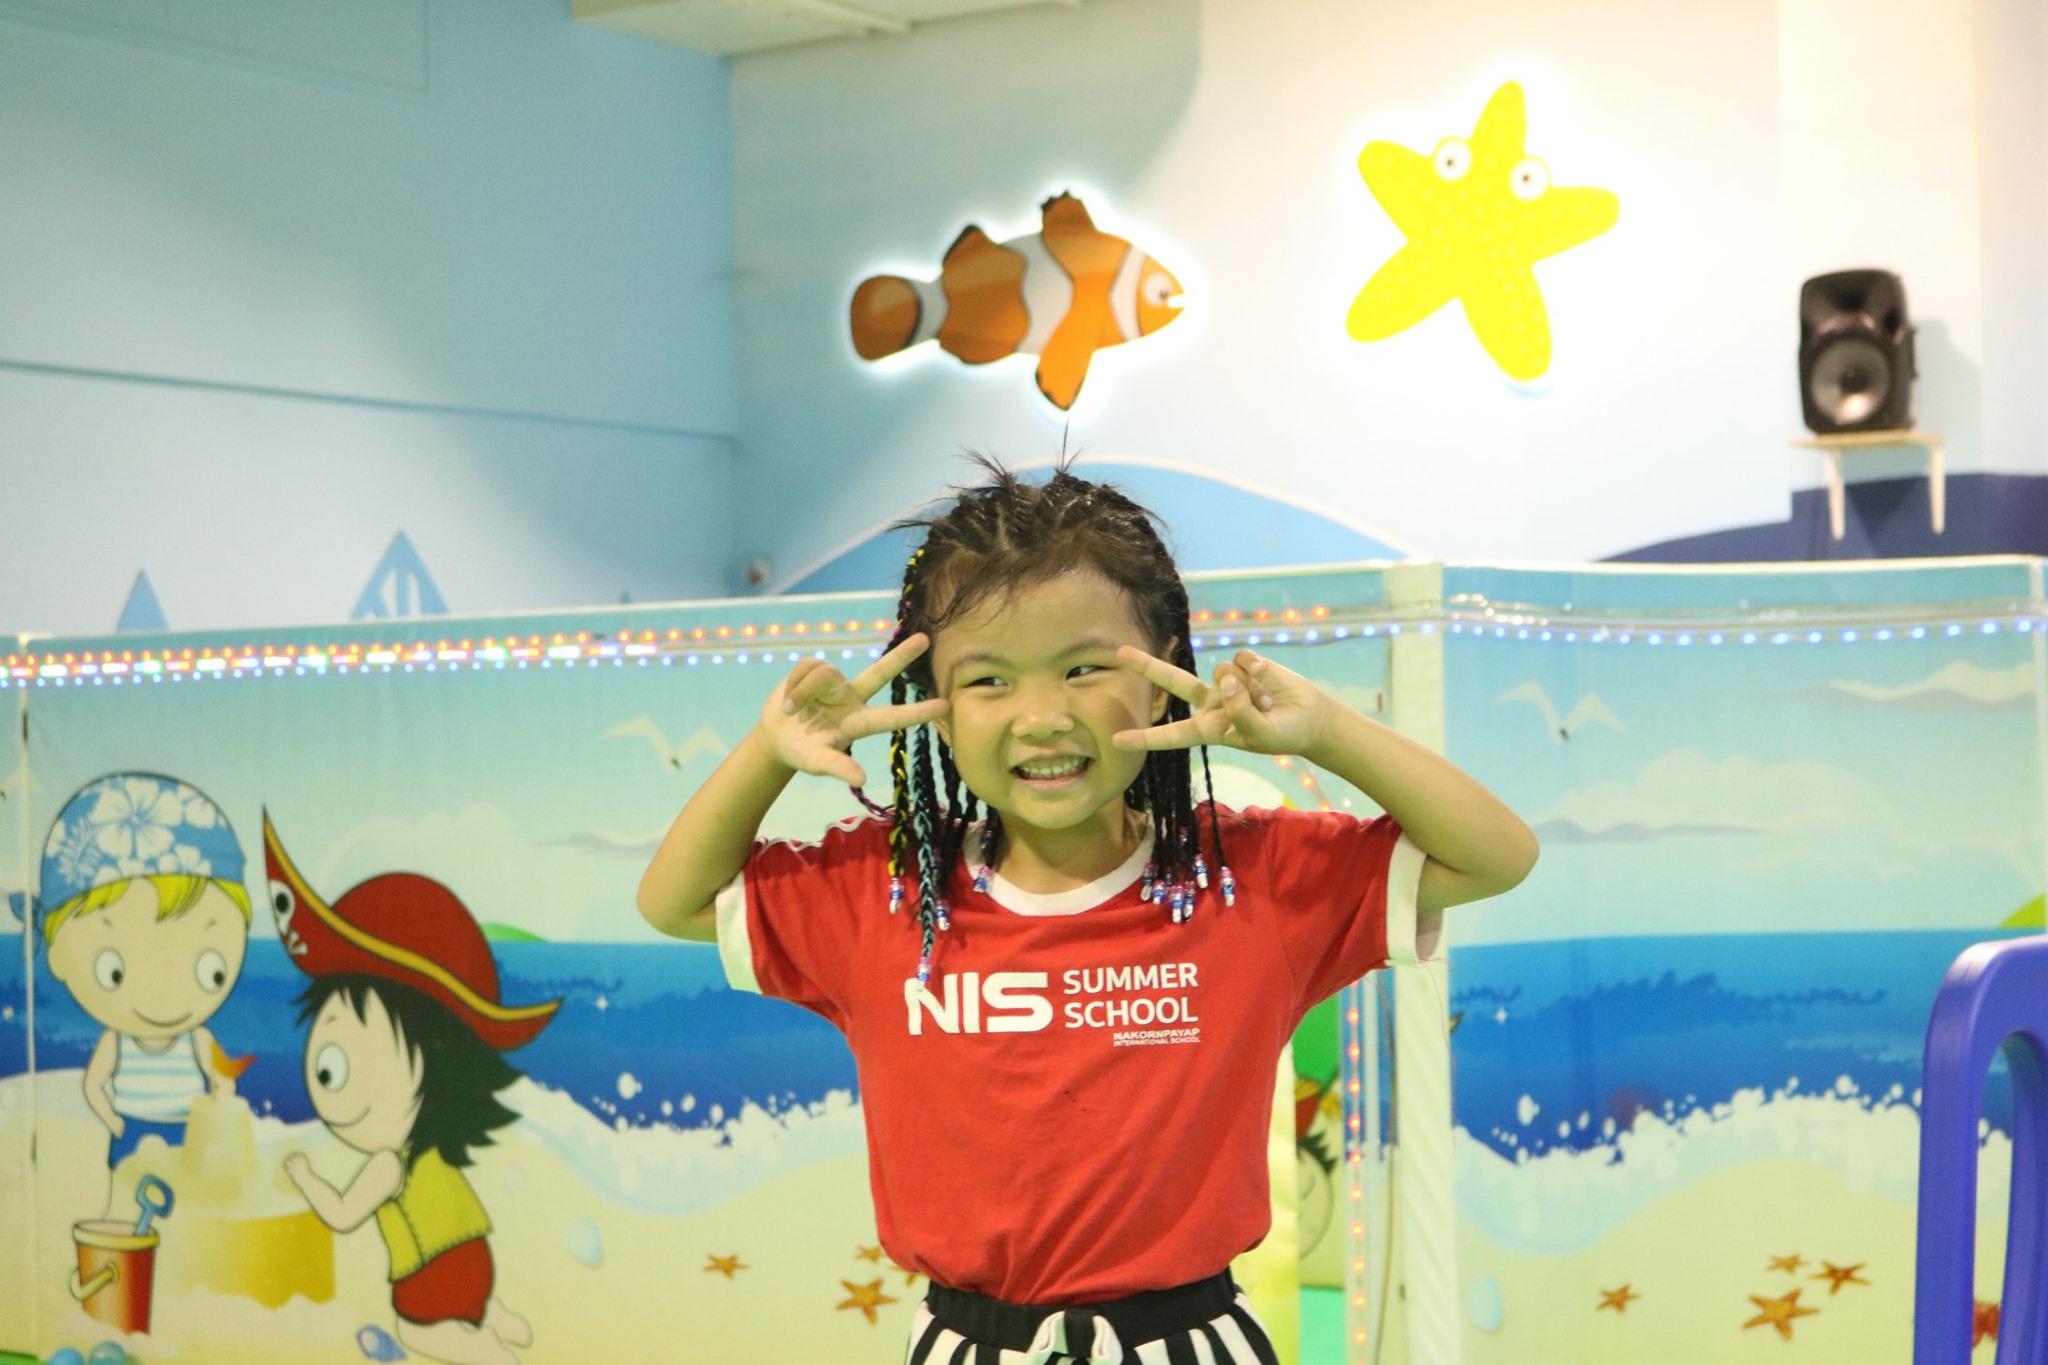 NIS-Summer-School-2019-Day-24-Kiddy-Land-62